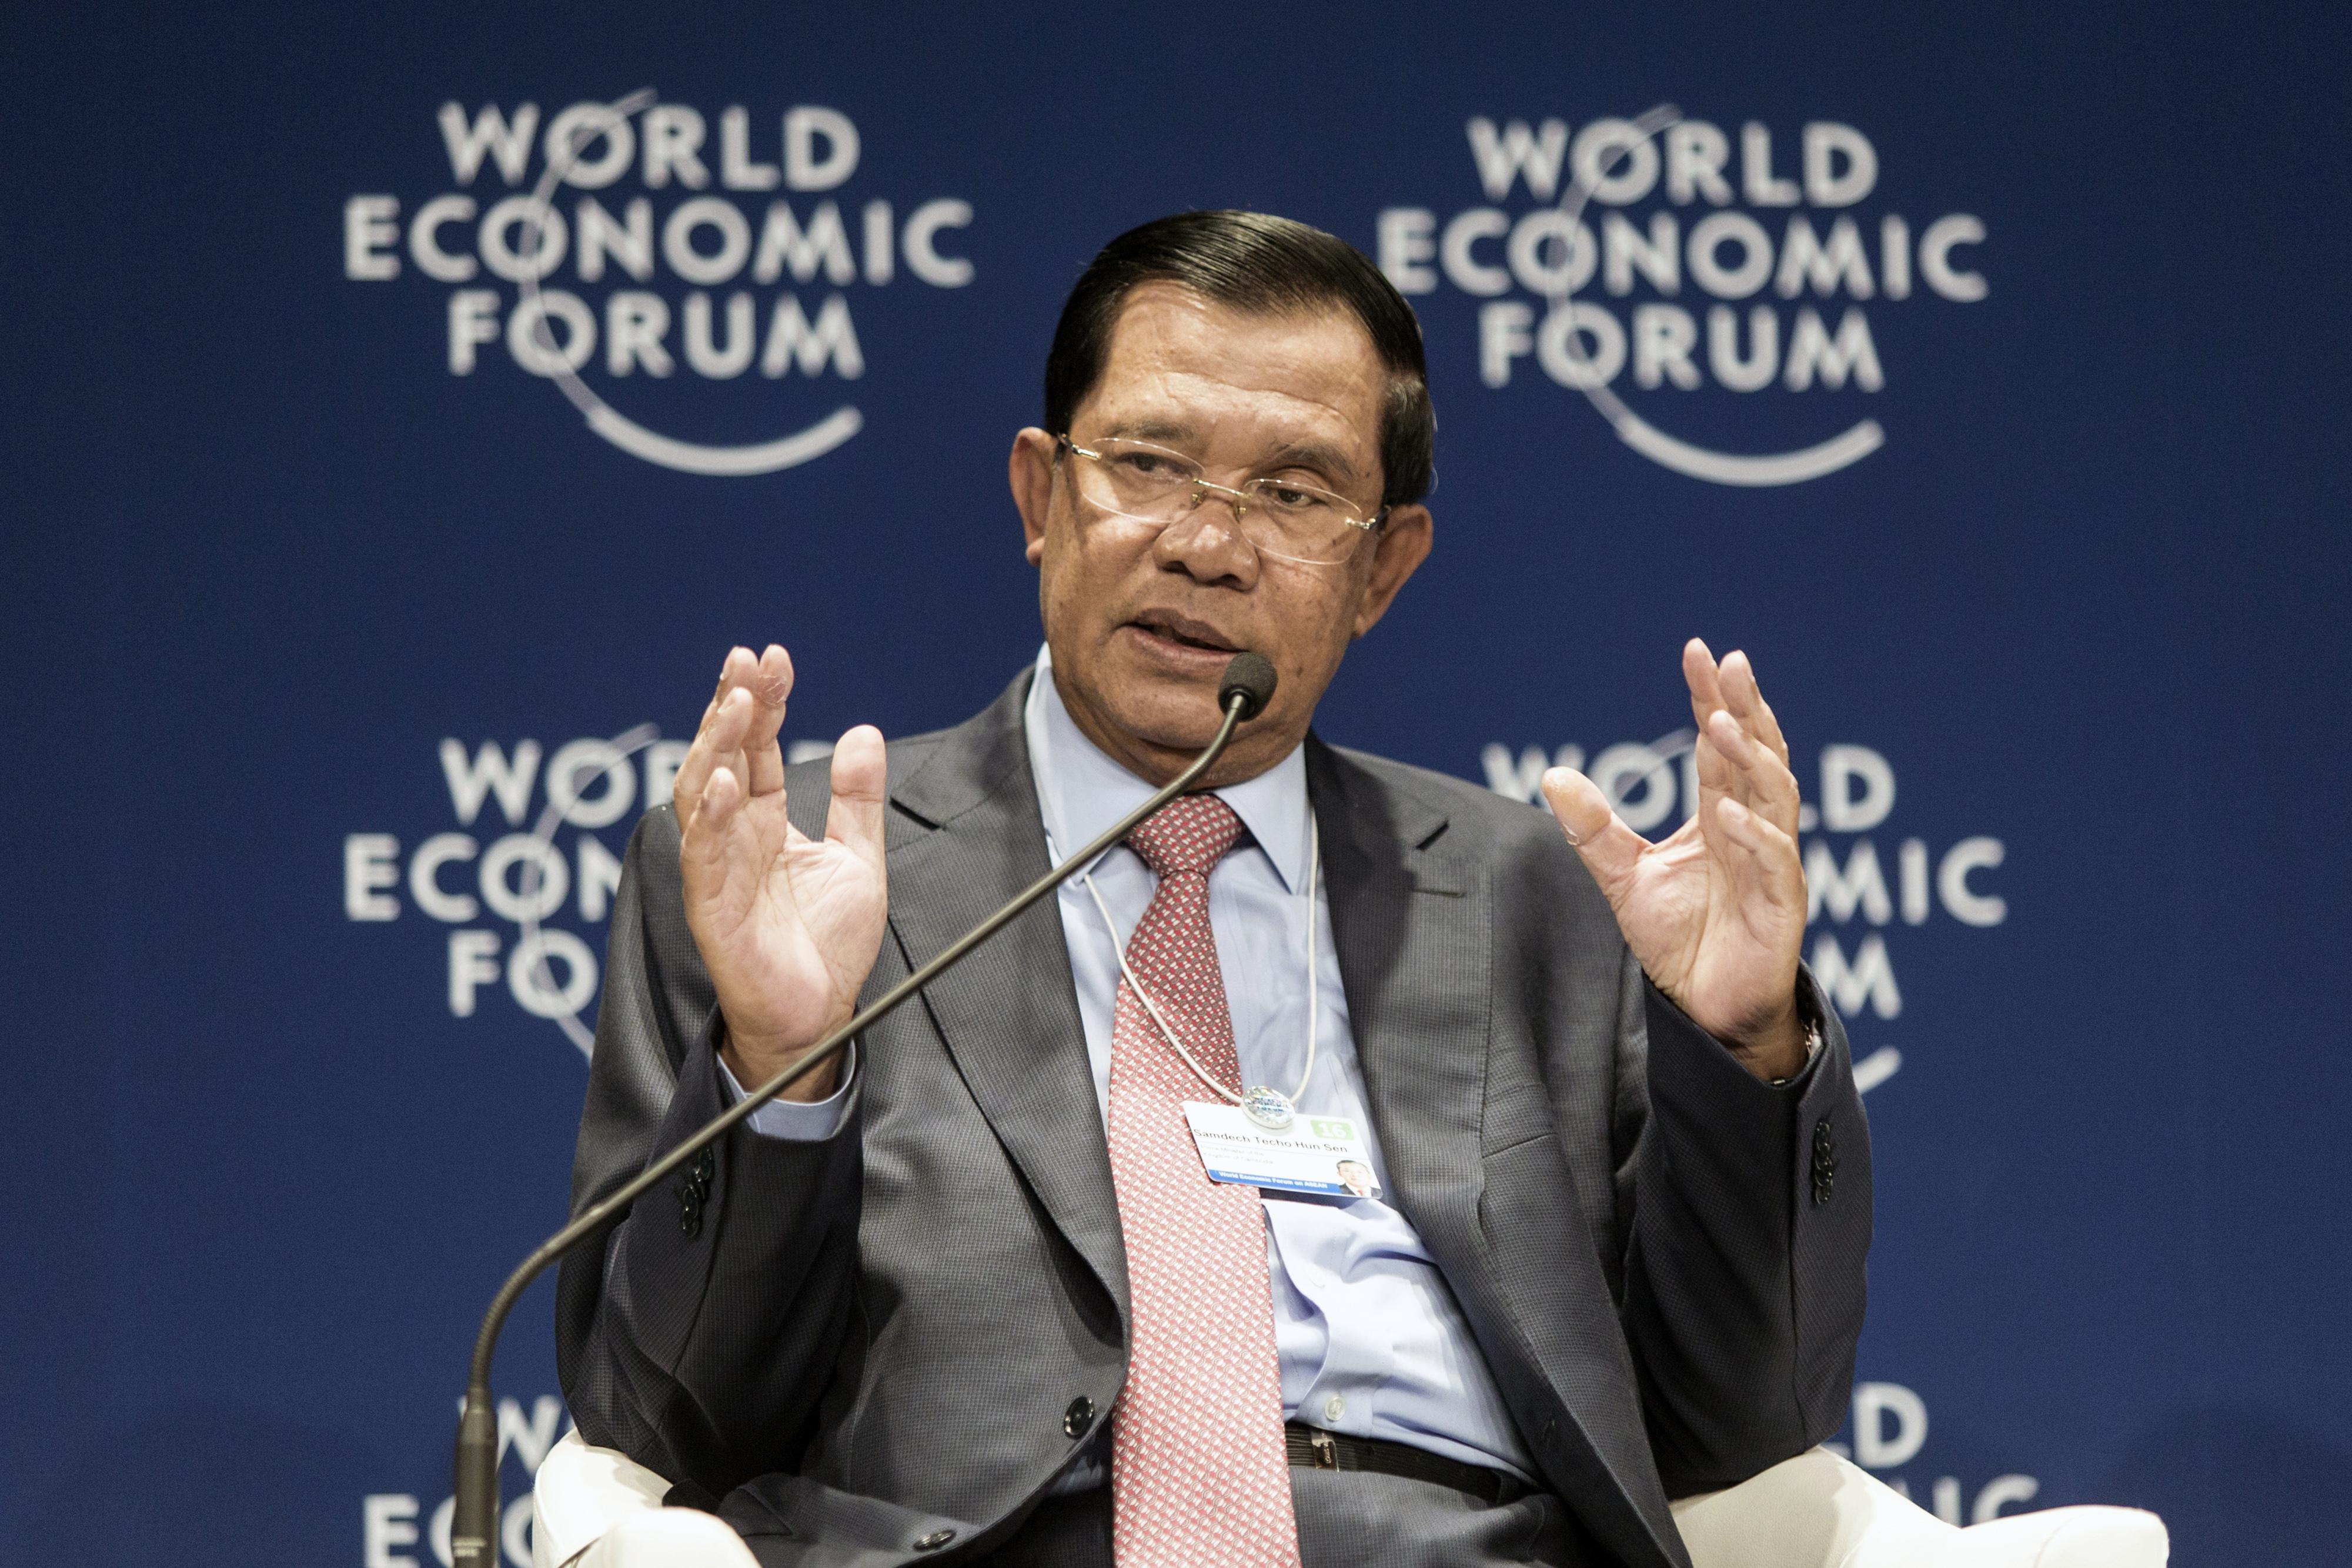 Hun Sen, Cambodia's prime minister, during the World Economic Forum in Kuala Lumpur, Malaysia, on June 1, 2016.